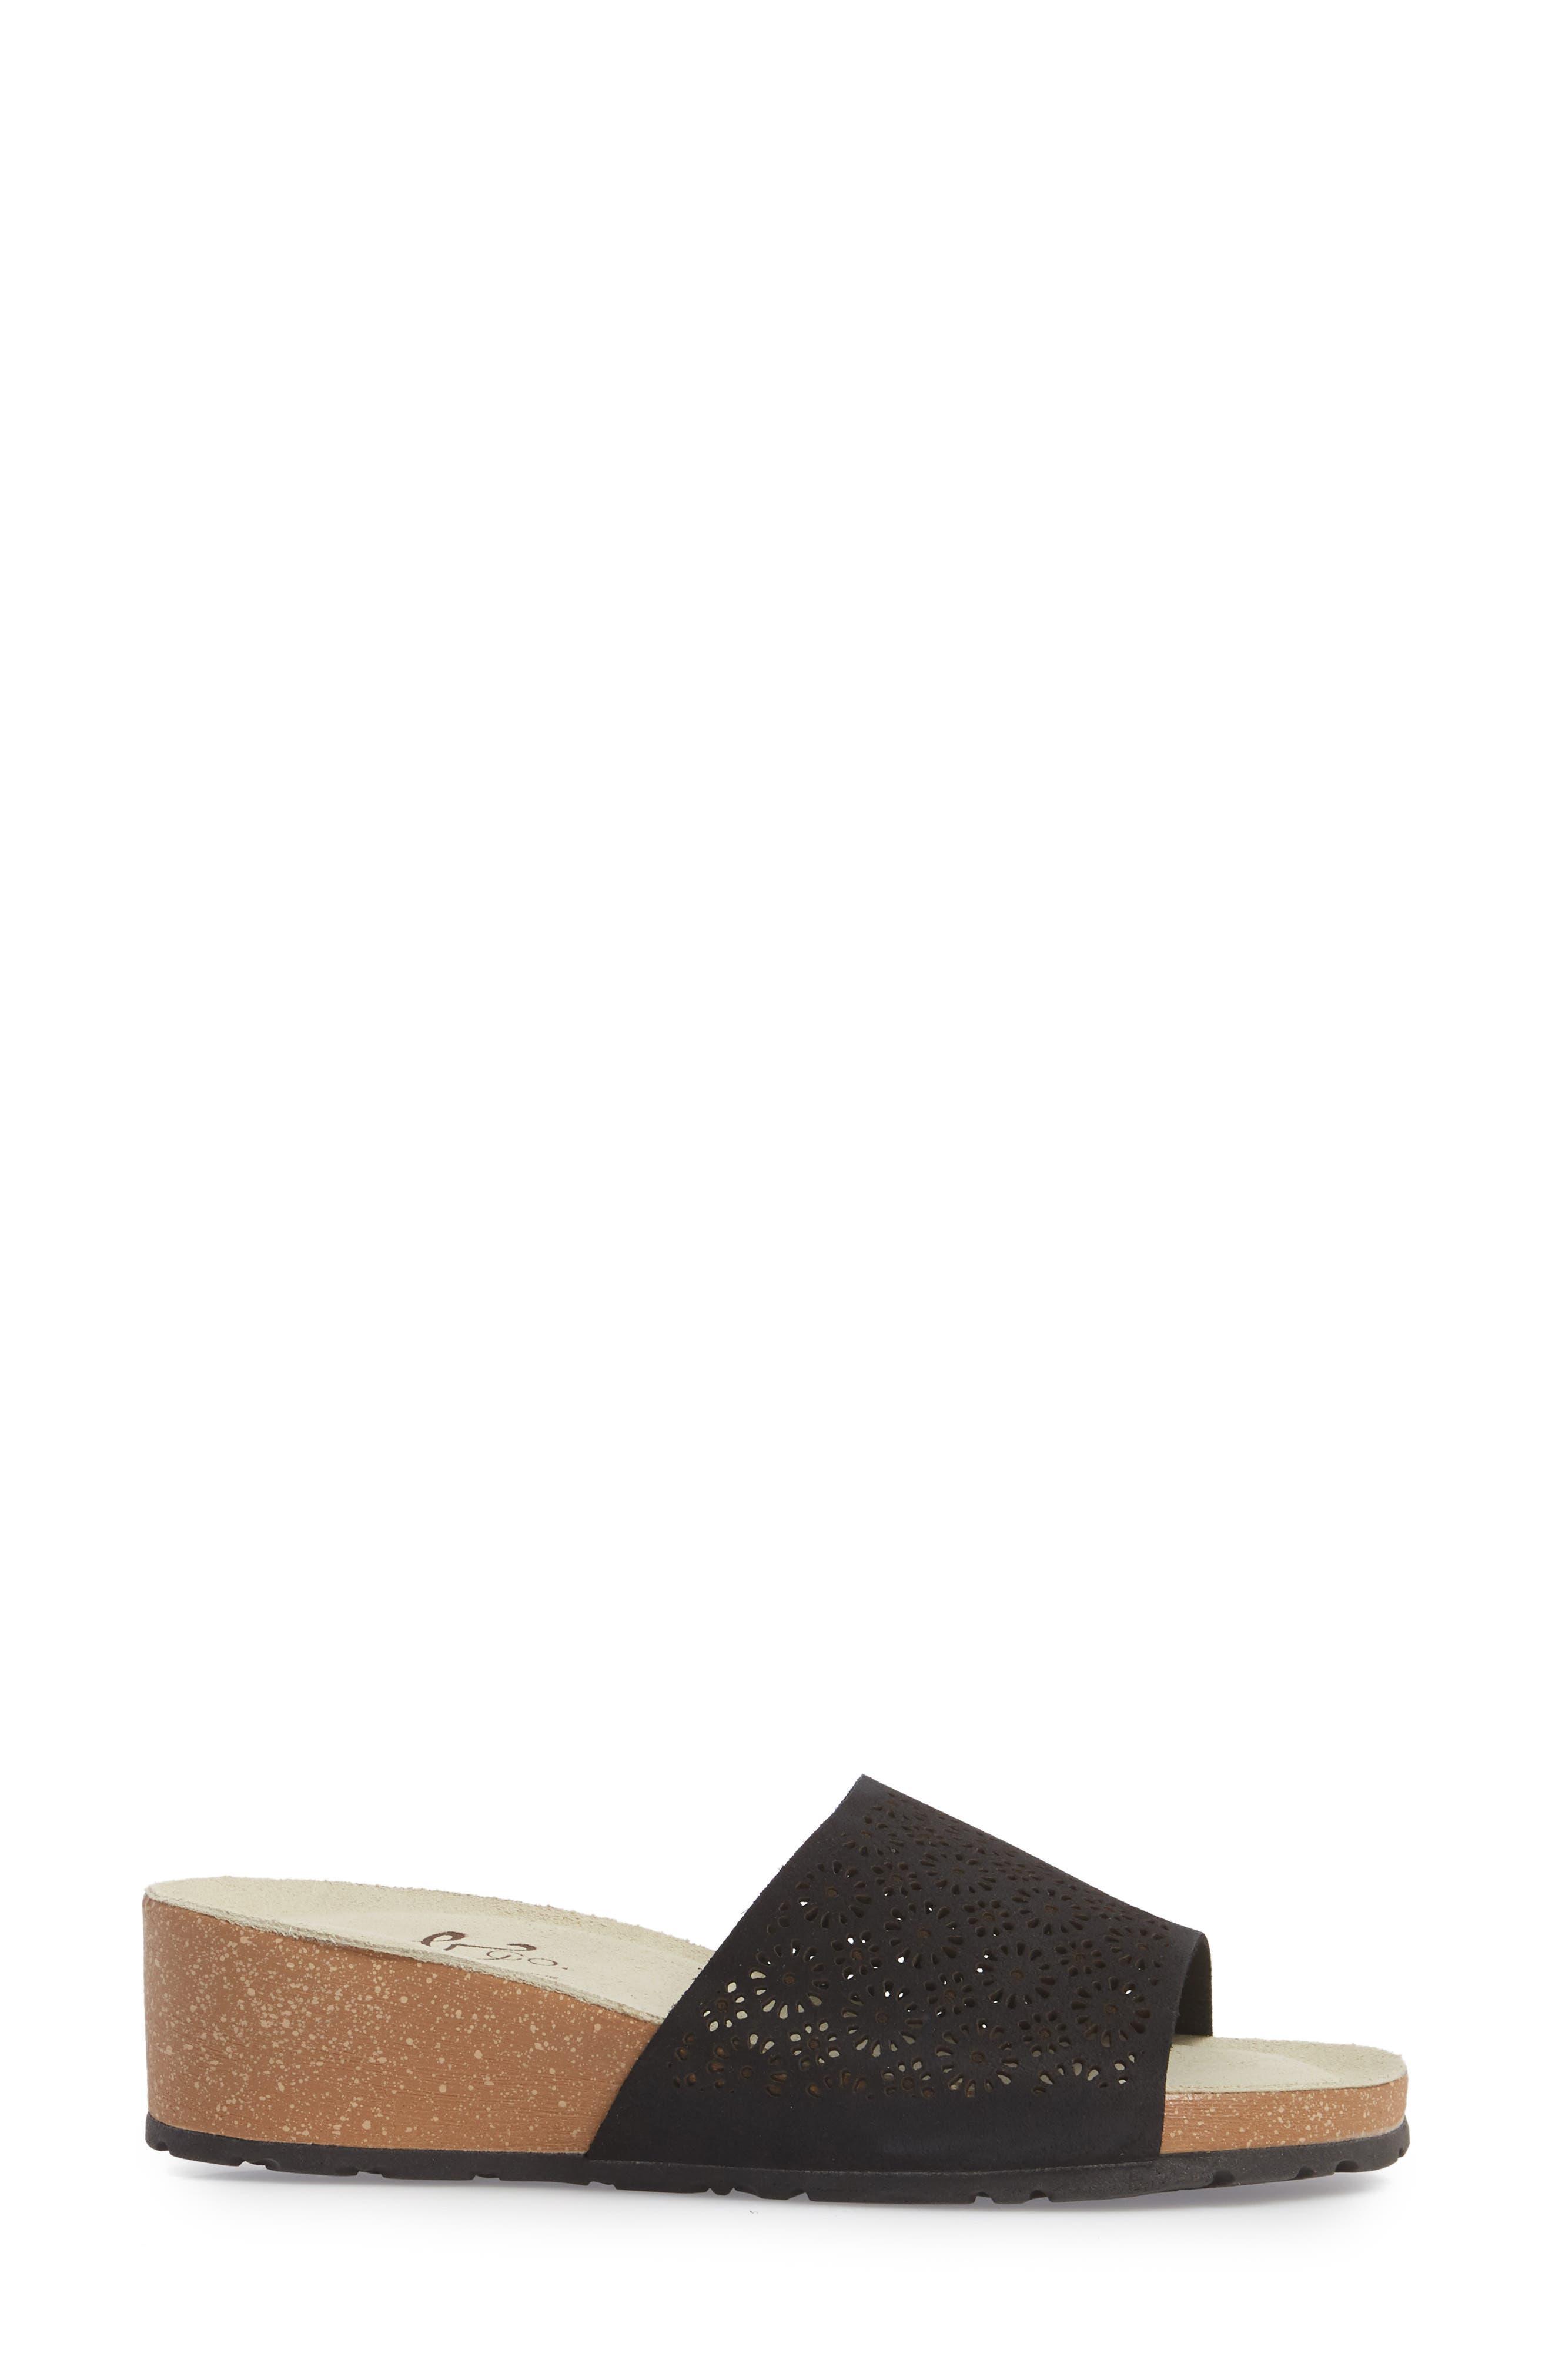 Loa Wedge Slide Sandal,                             Alternate thumbnail 3, color,                             BLACK SUEDE